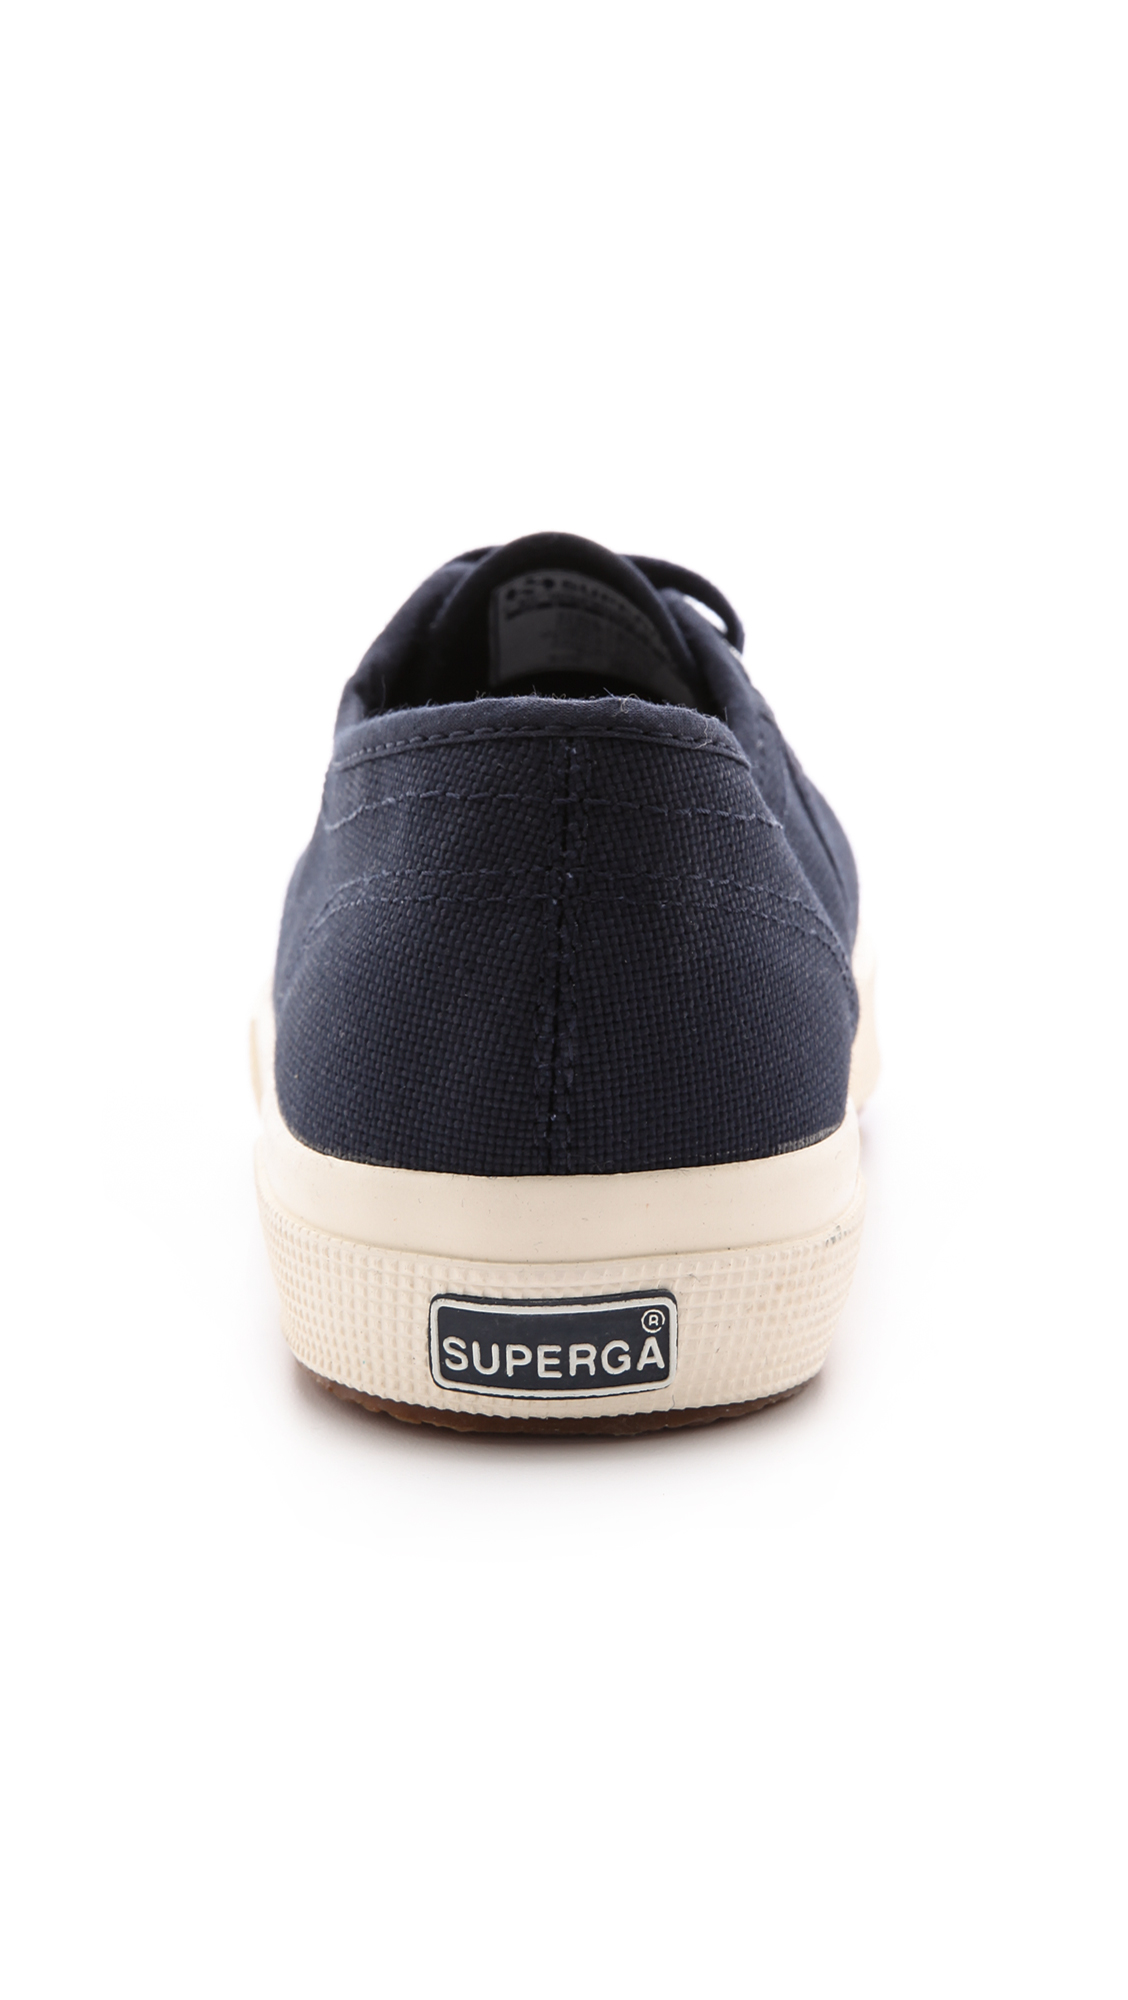 online store 4b730 0666a Superga 2750 Cotu Classic Sneakers  EAST DANE